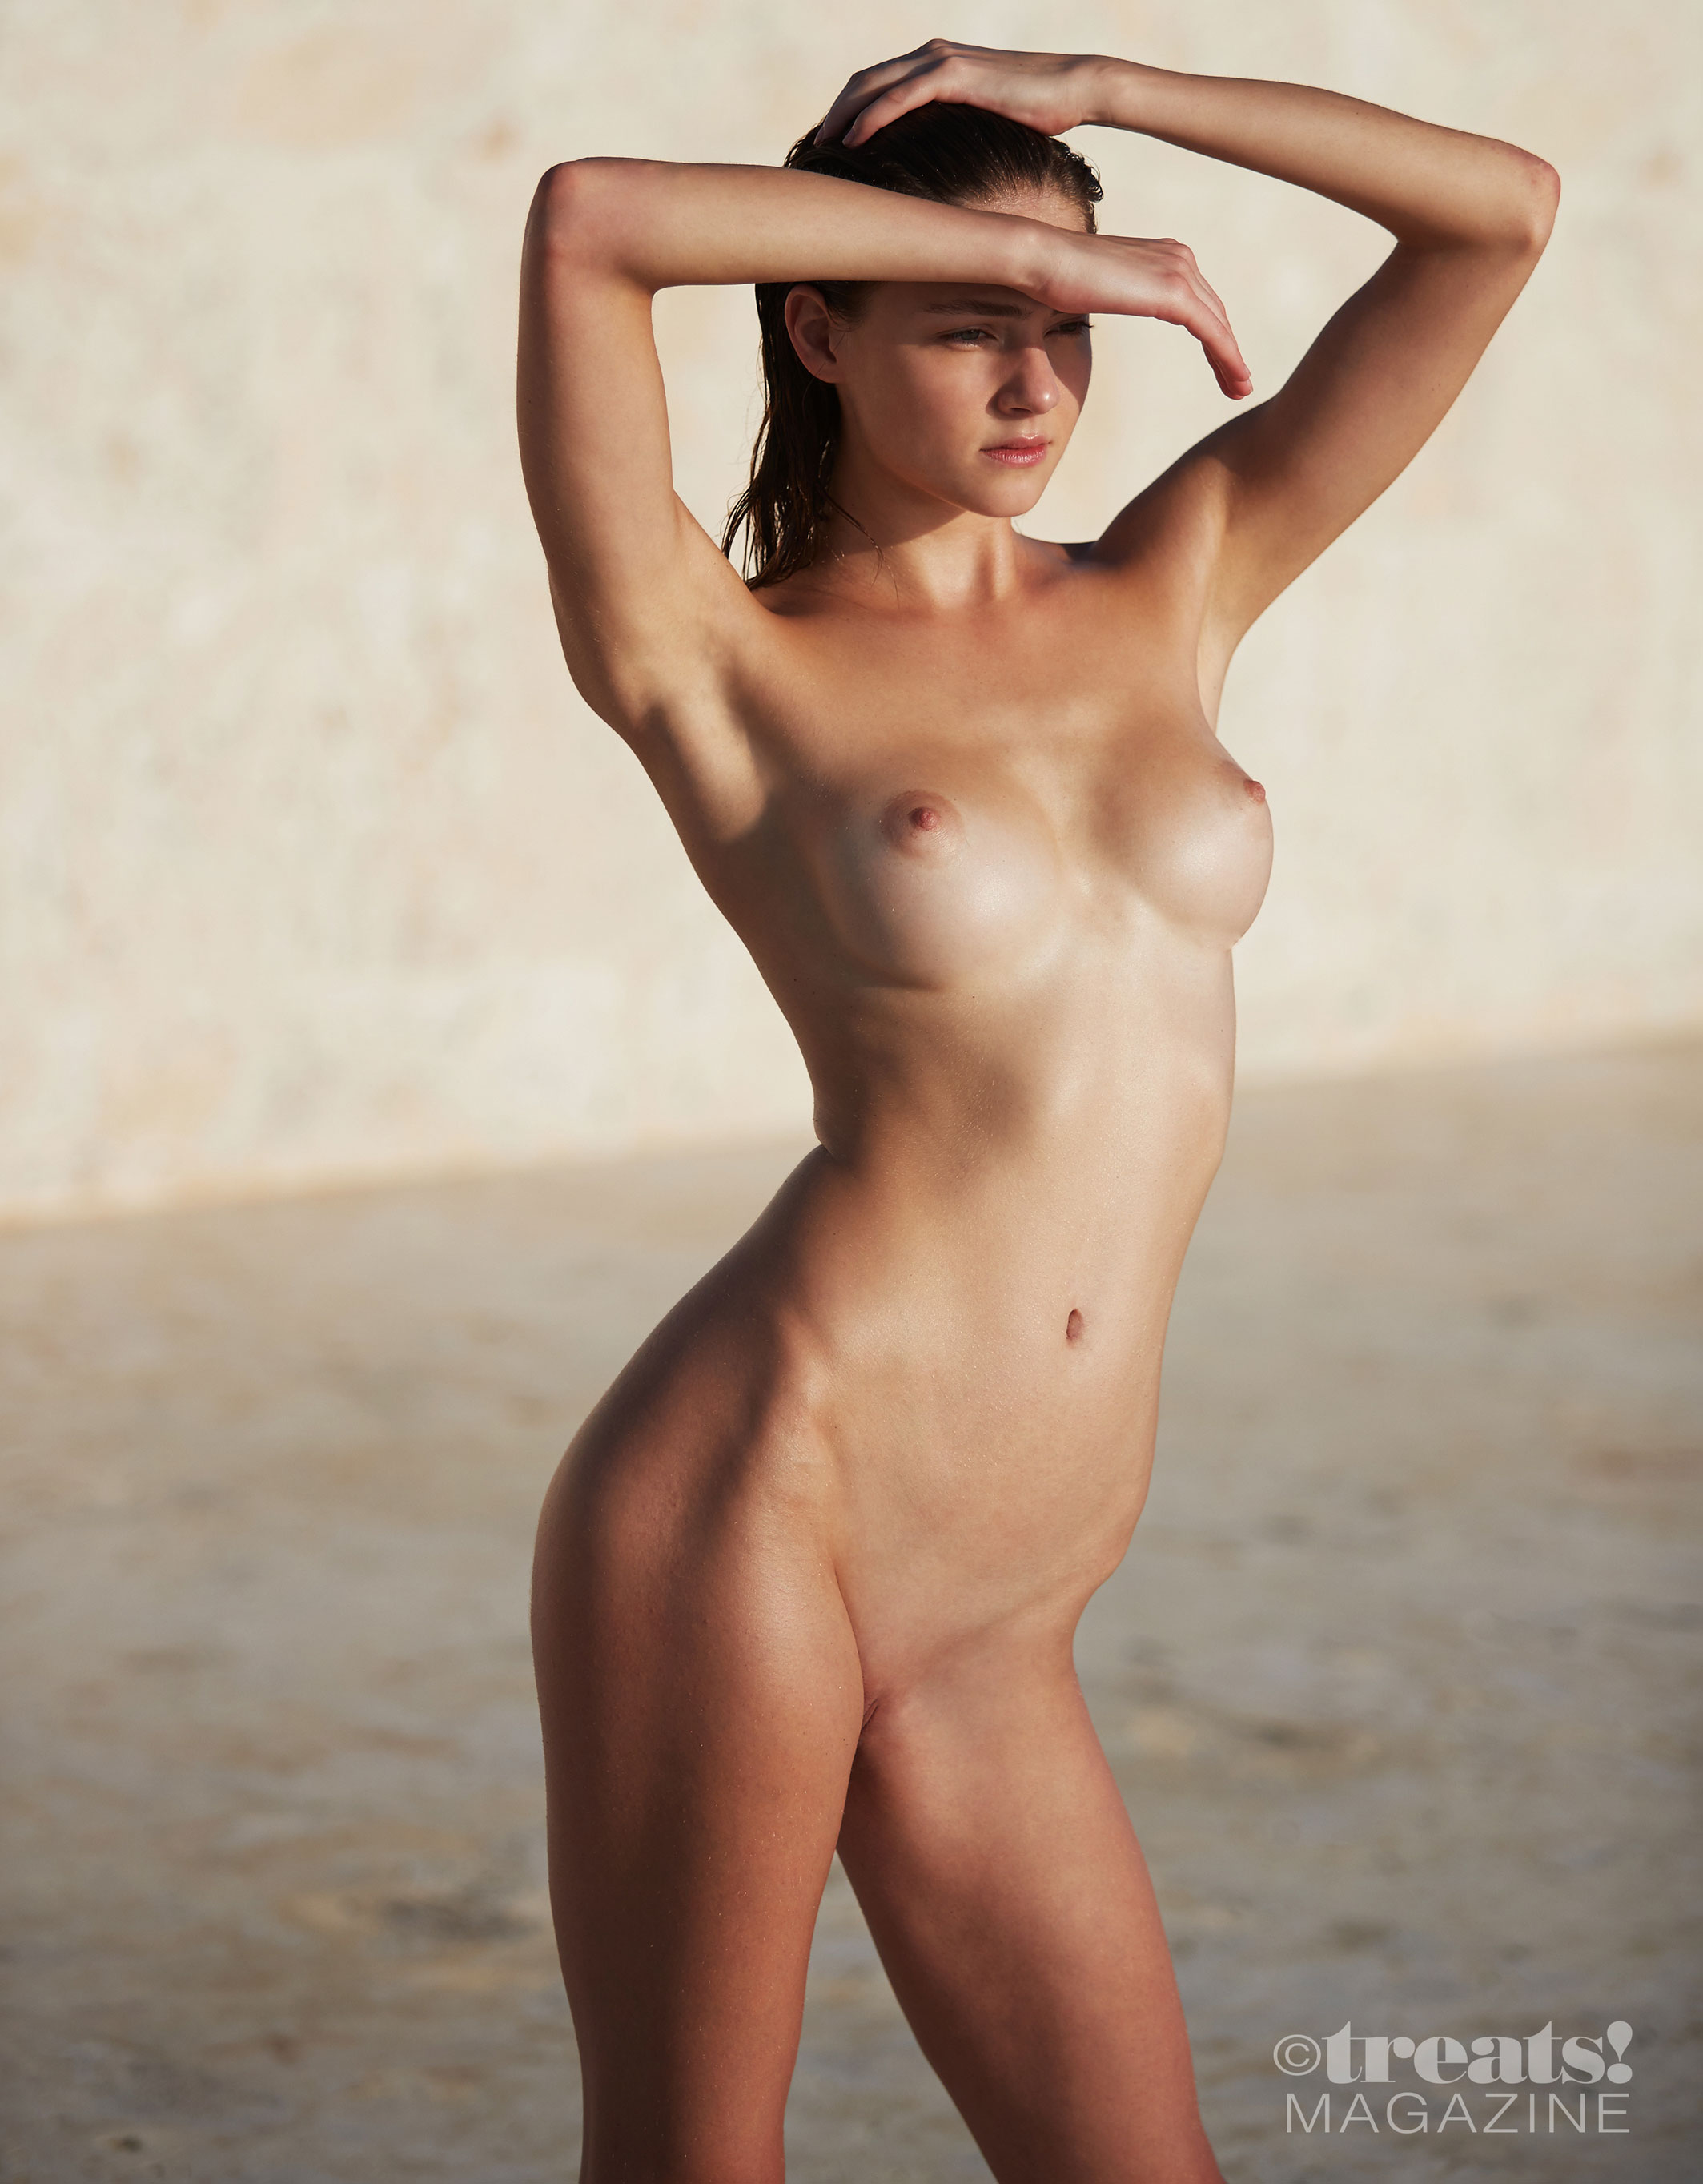 голая Вика Левина на страницах журнала Treats! / фото 12